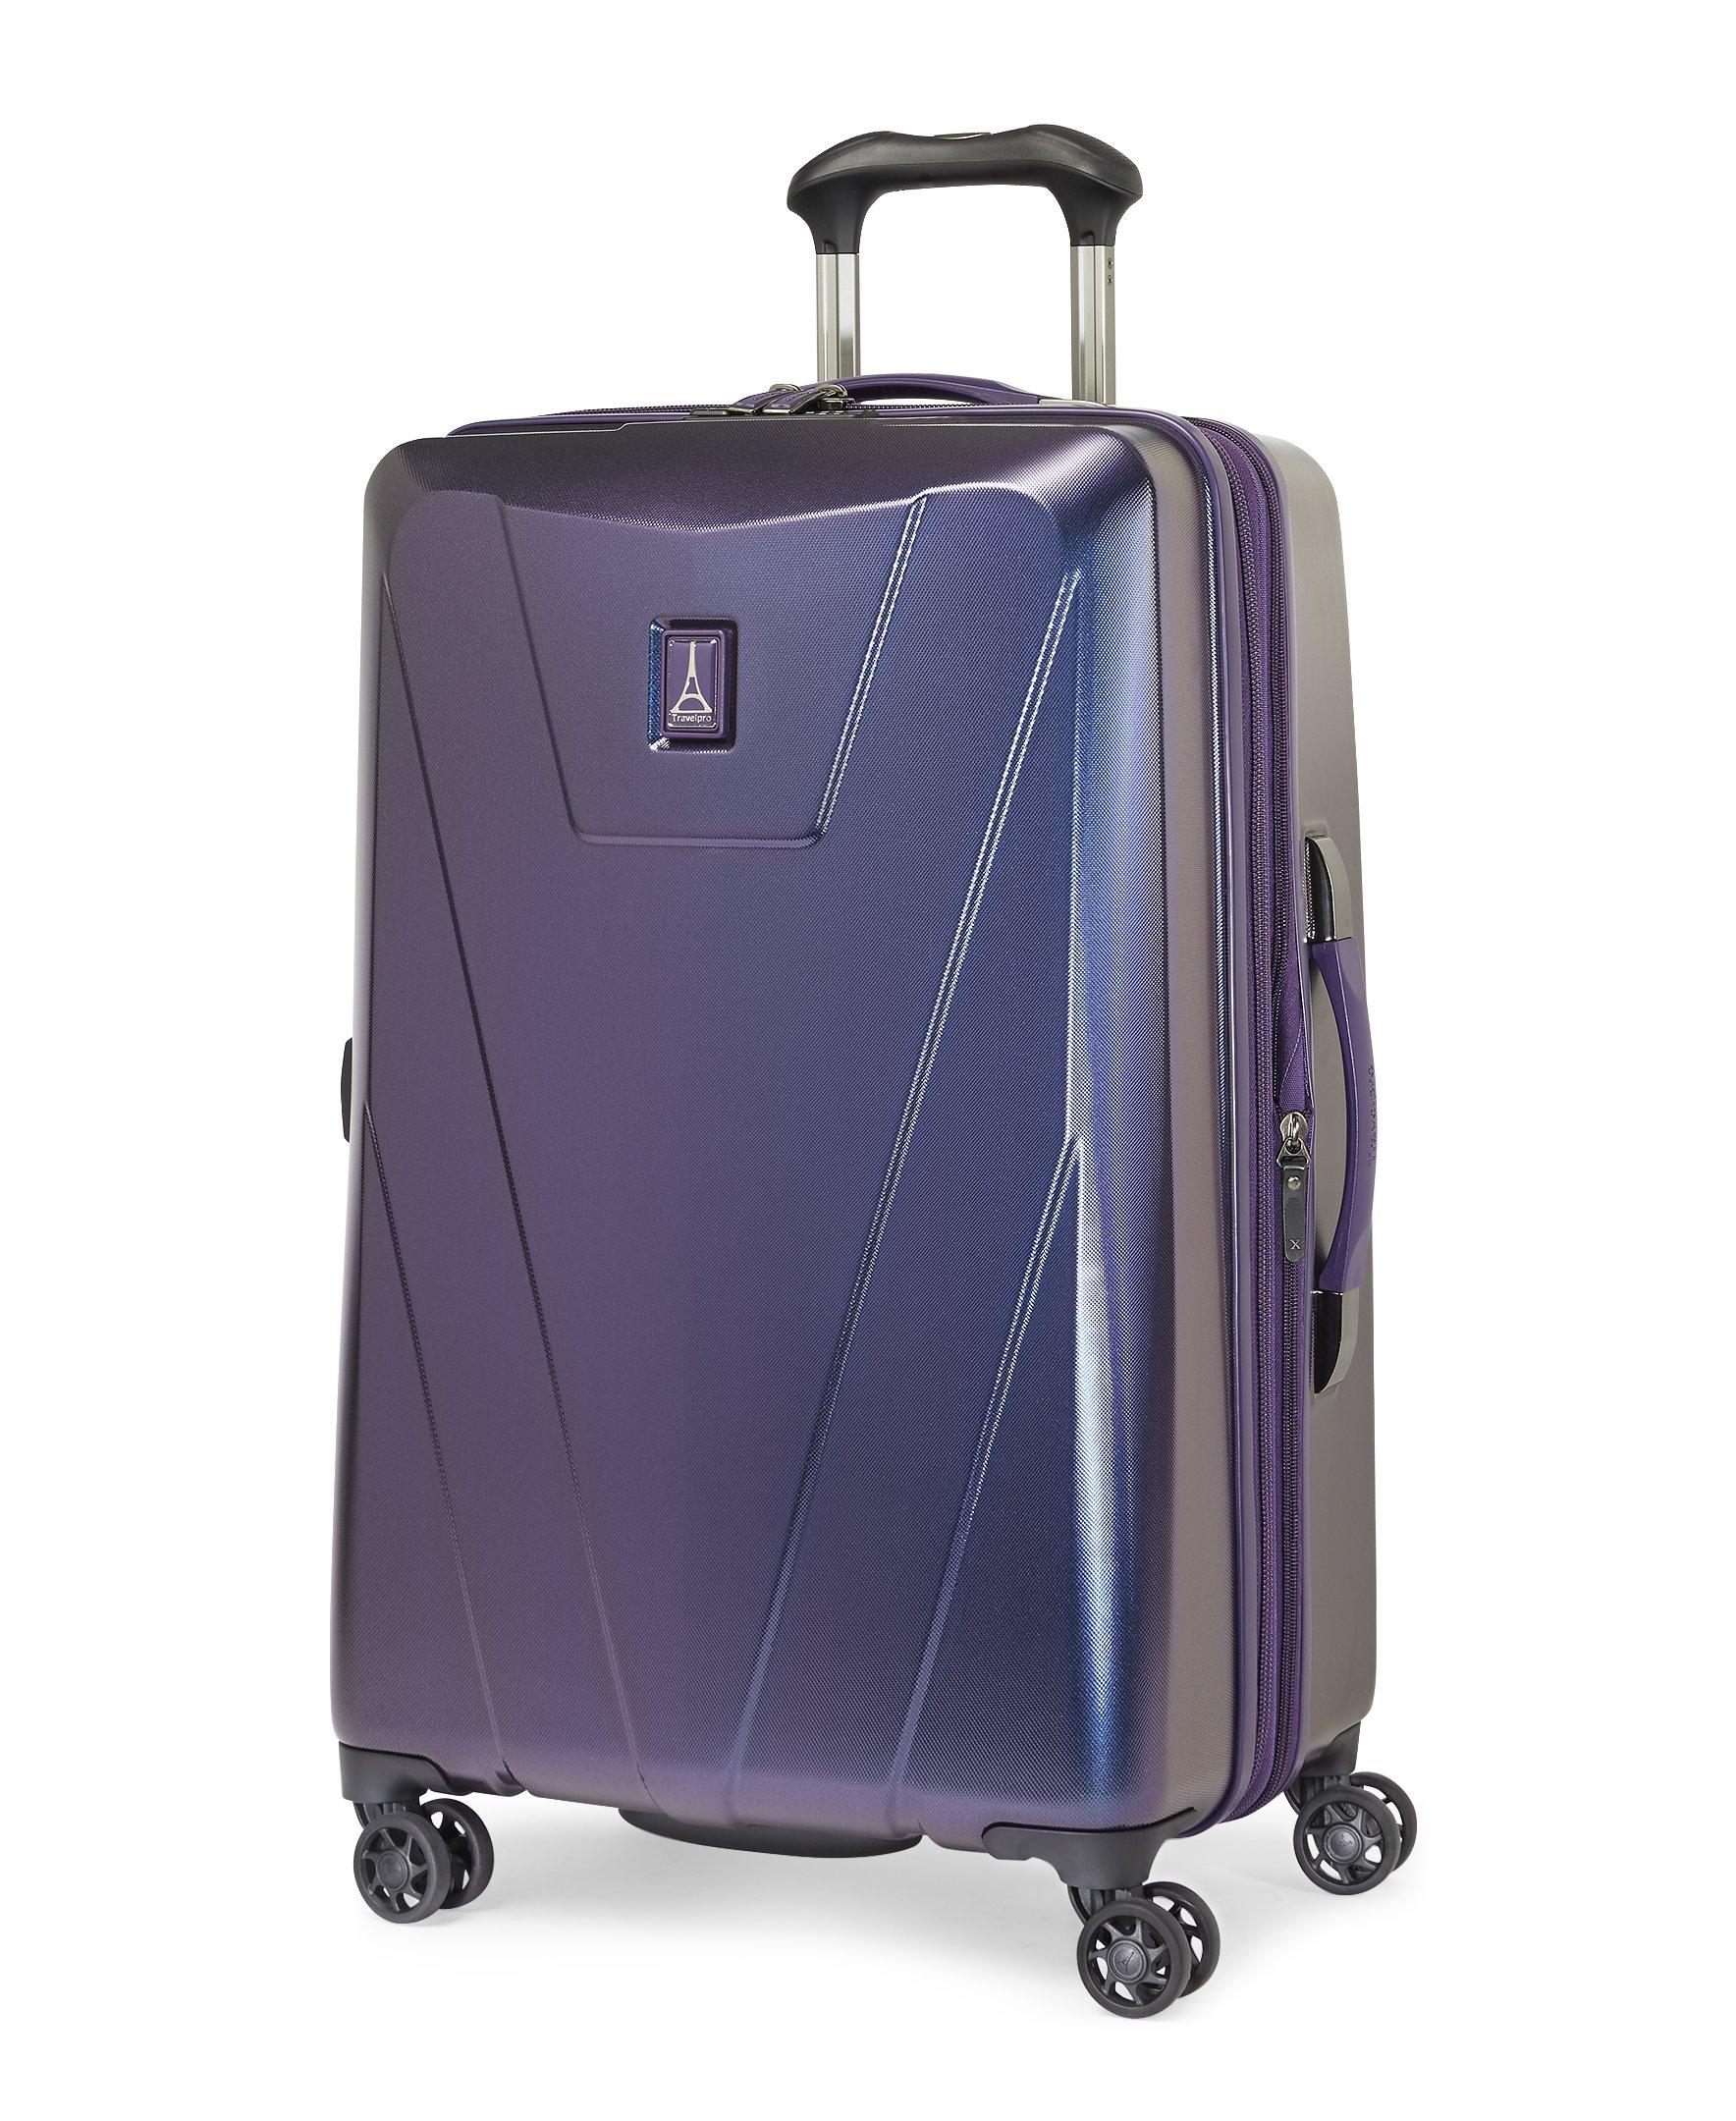 Travelpro Maxlite 4 25'' Hardside Spinner, Dark Purple